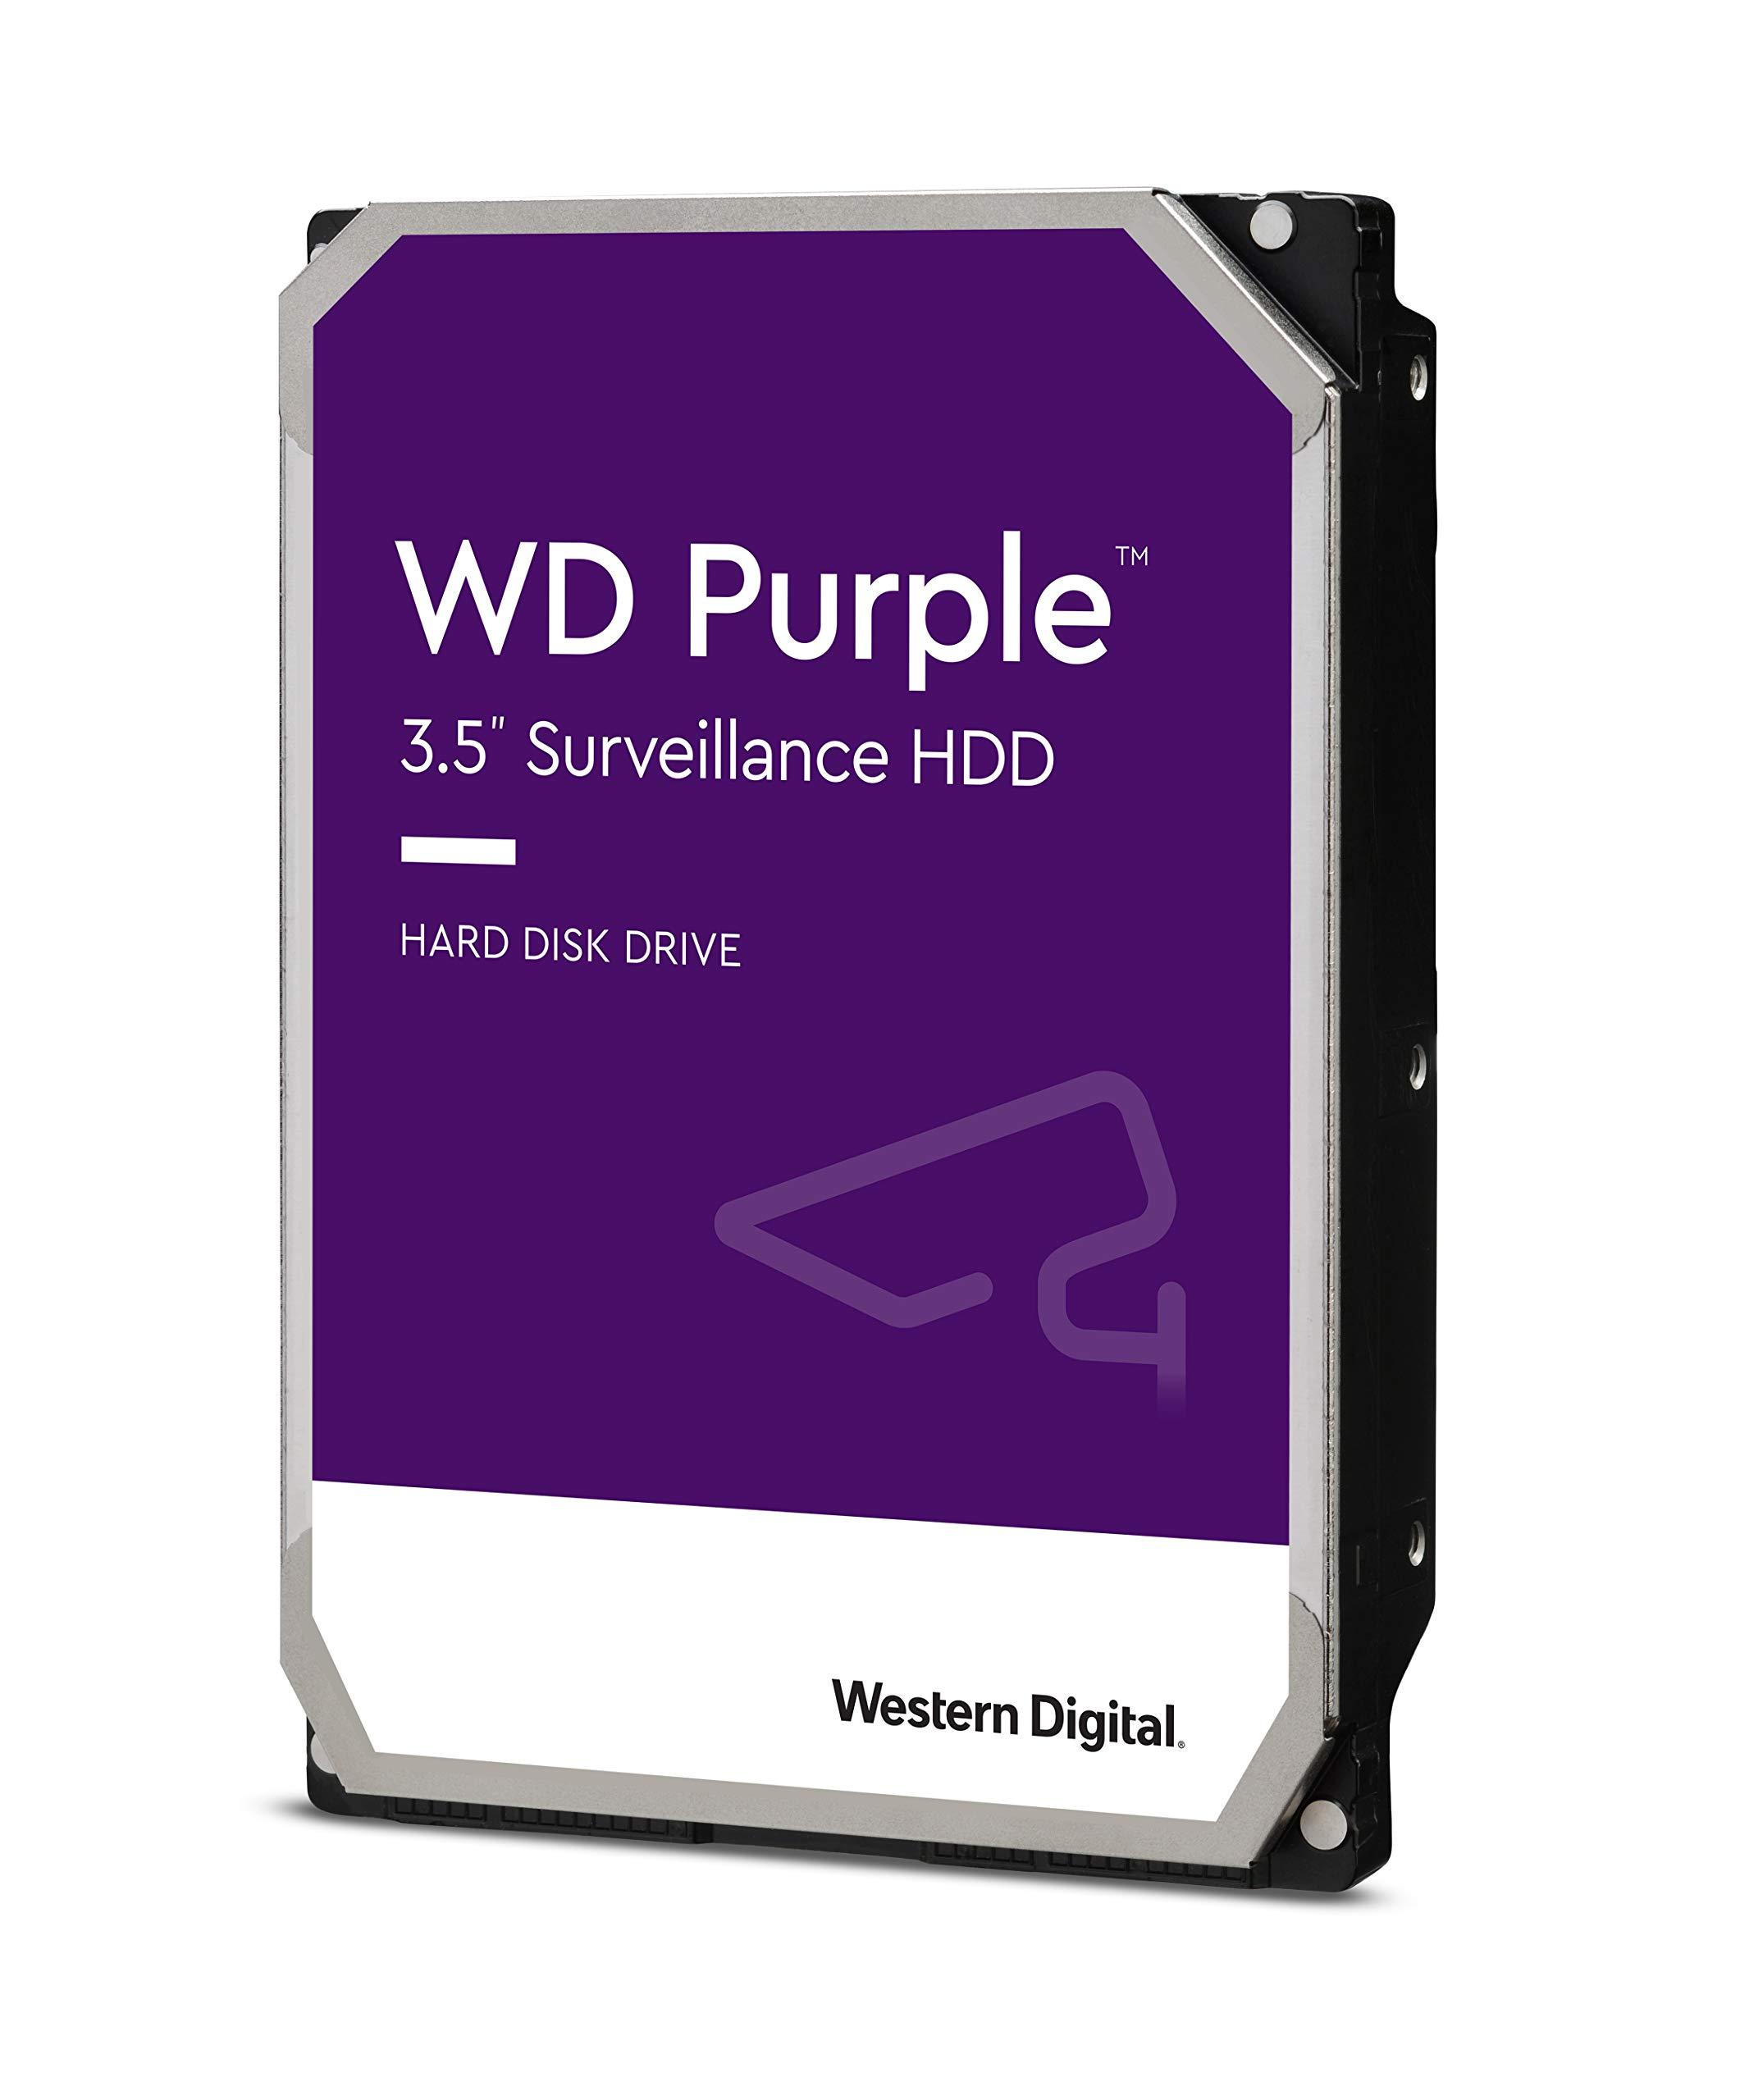 Western Digital Purple 1TB Surveillance 3.5 Inch SATA 6 Gb/s Hard Disk Drive with Allframe 4K Technology - 180TB/yr, 64MB Cache, 5400rpm - WD10PURZ